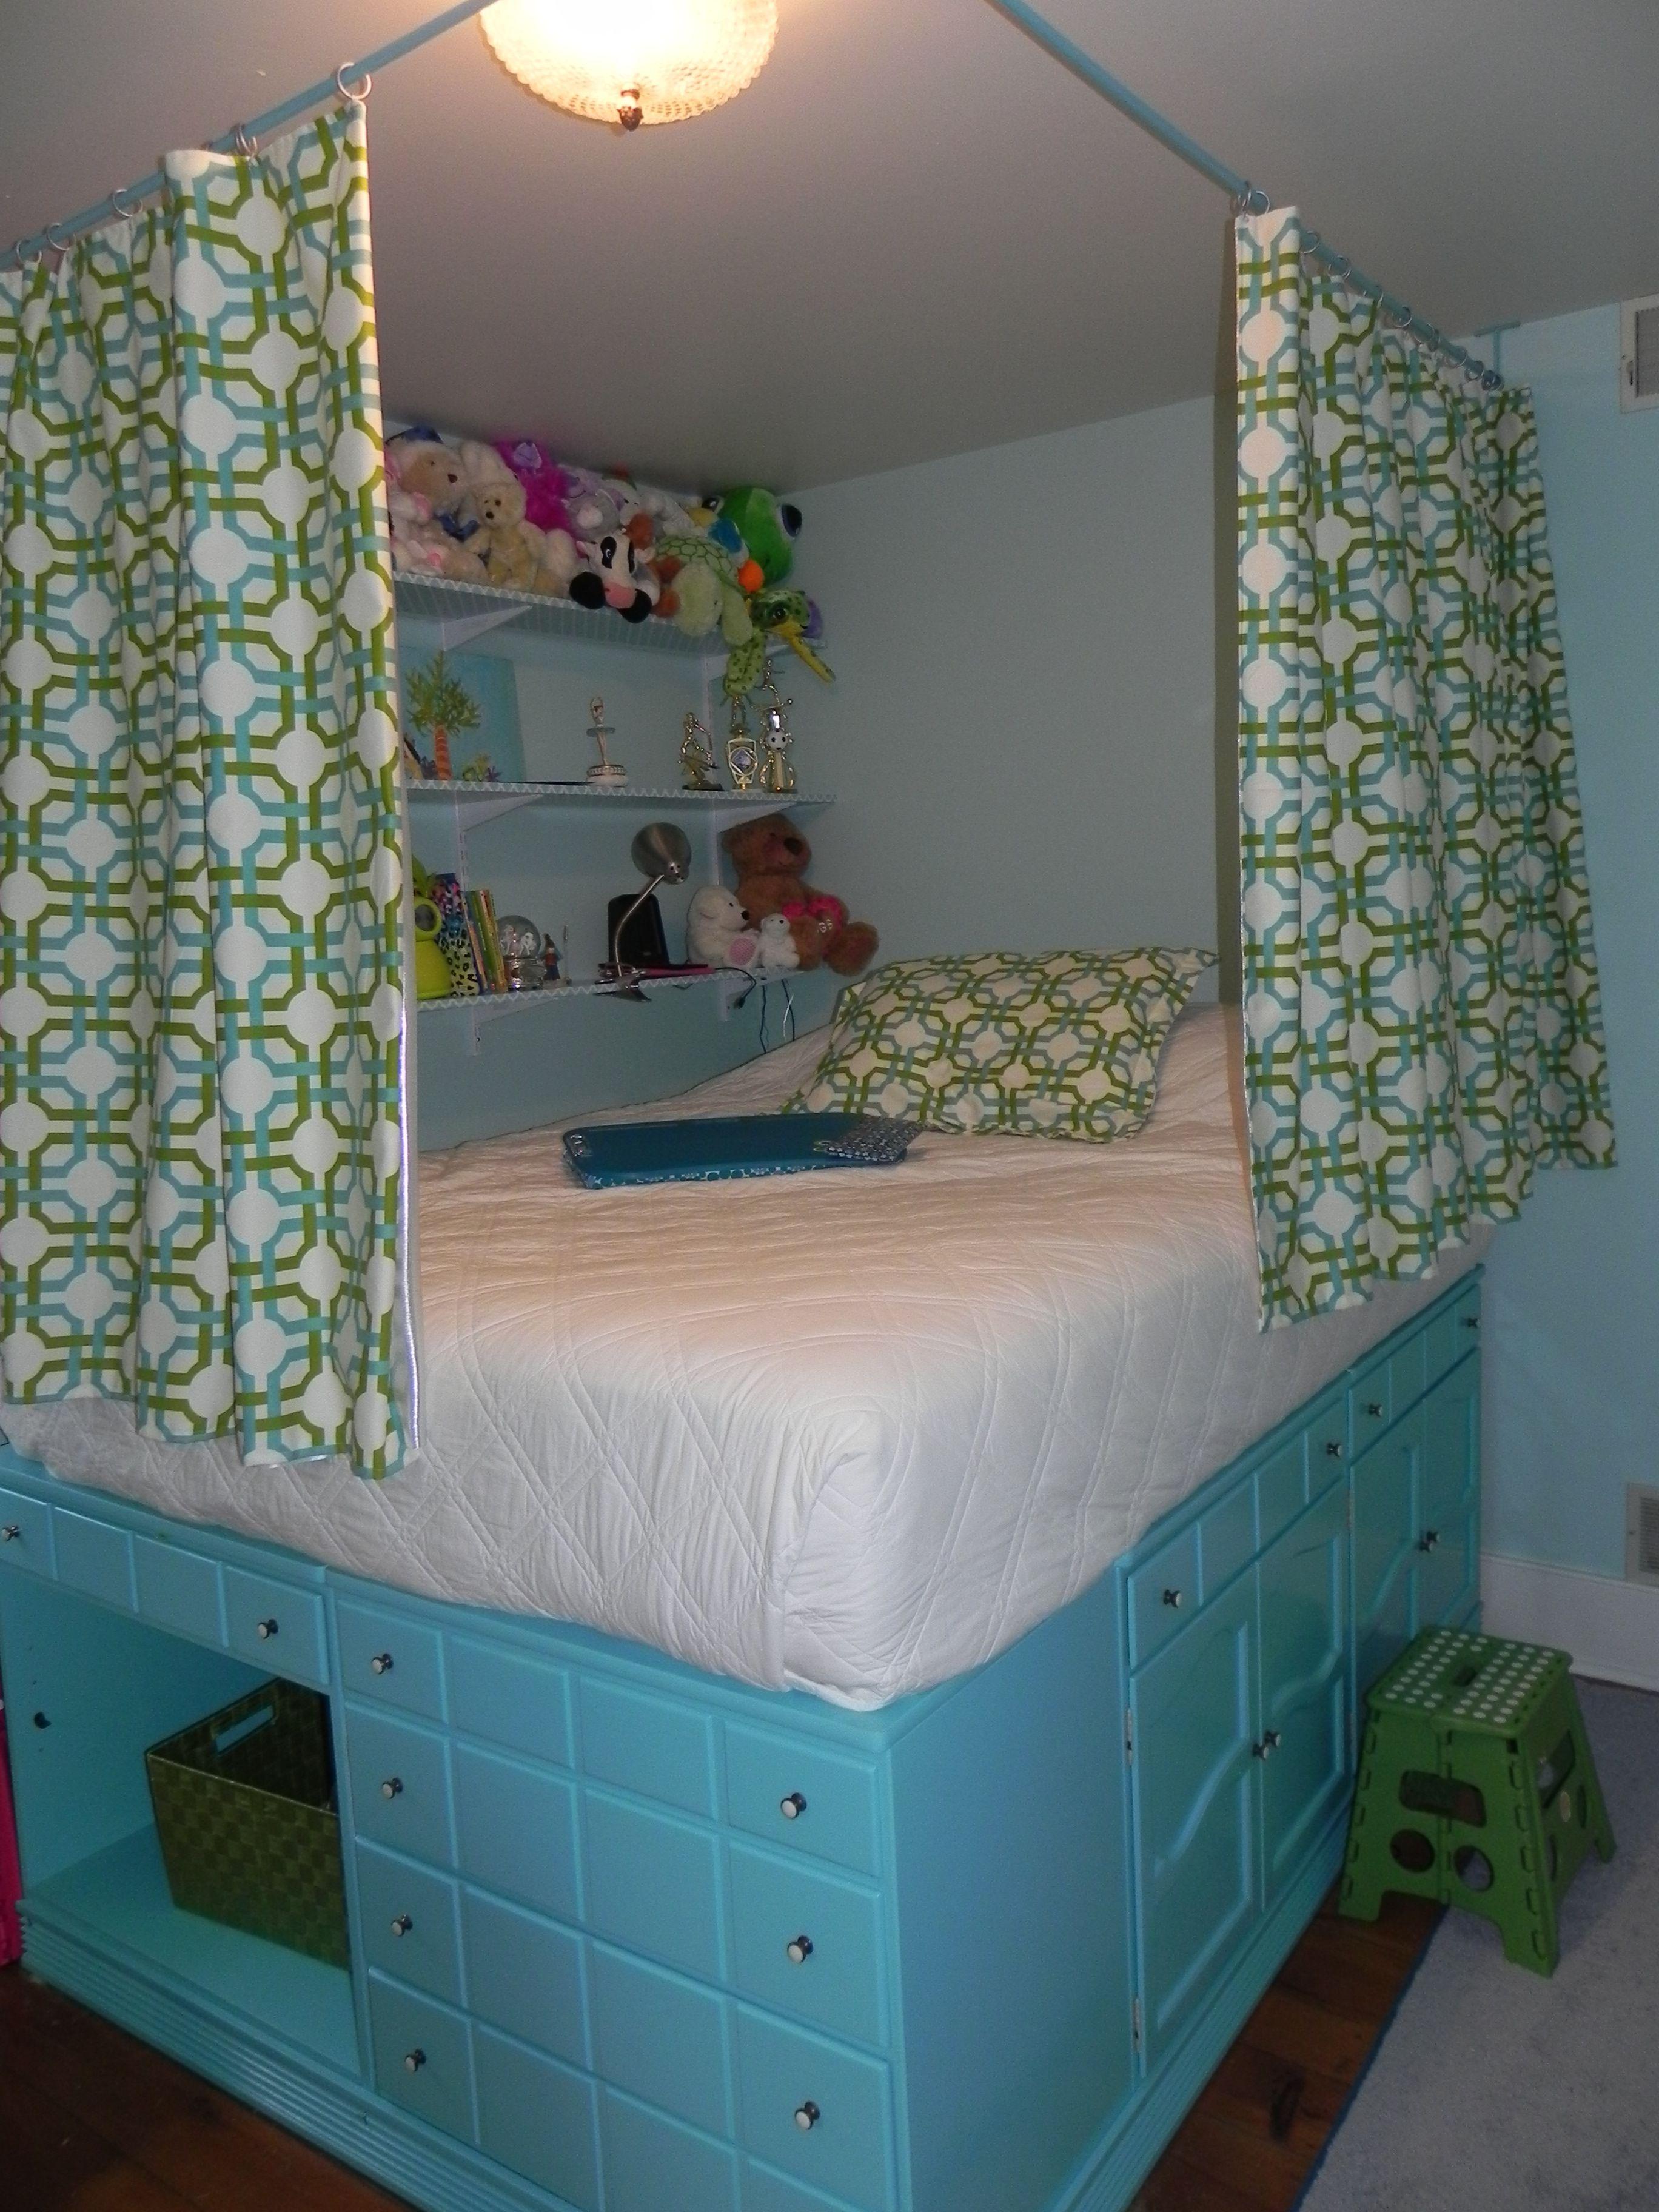 Claires bedroom repurposed dressers diy loft bed